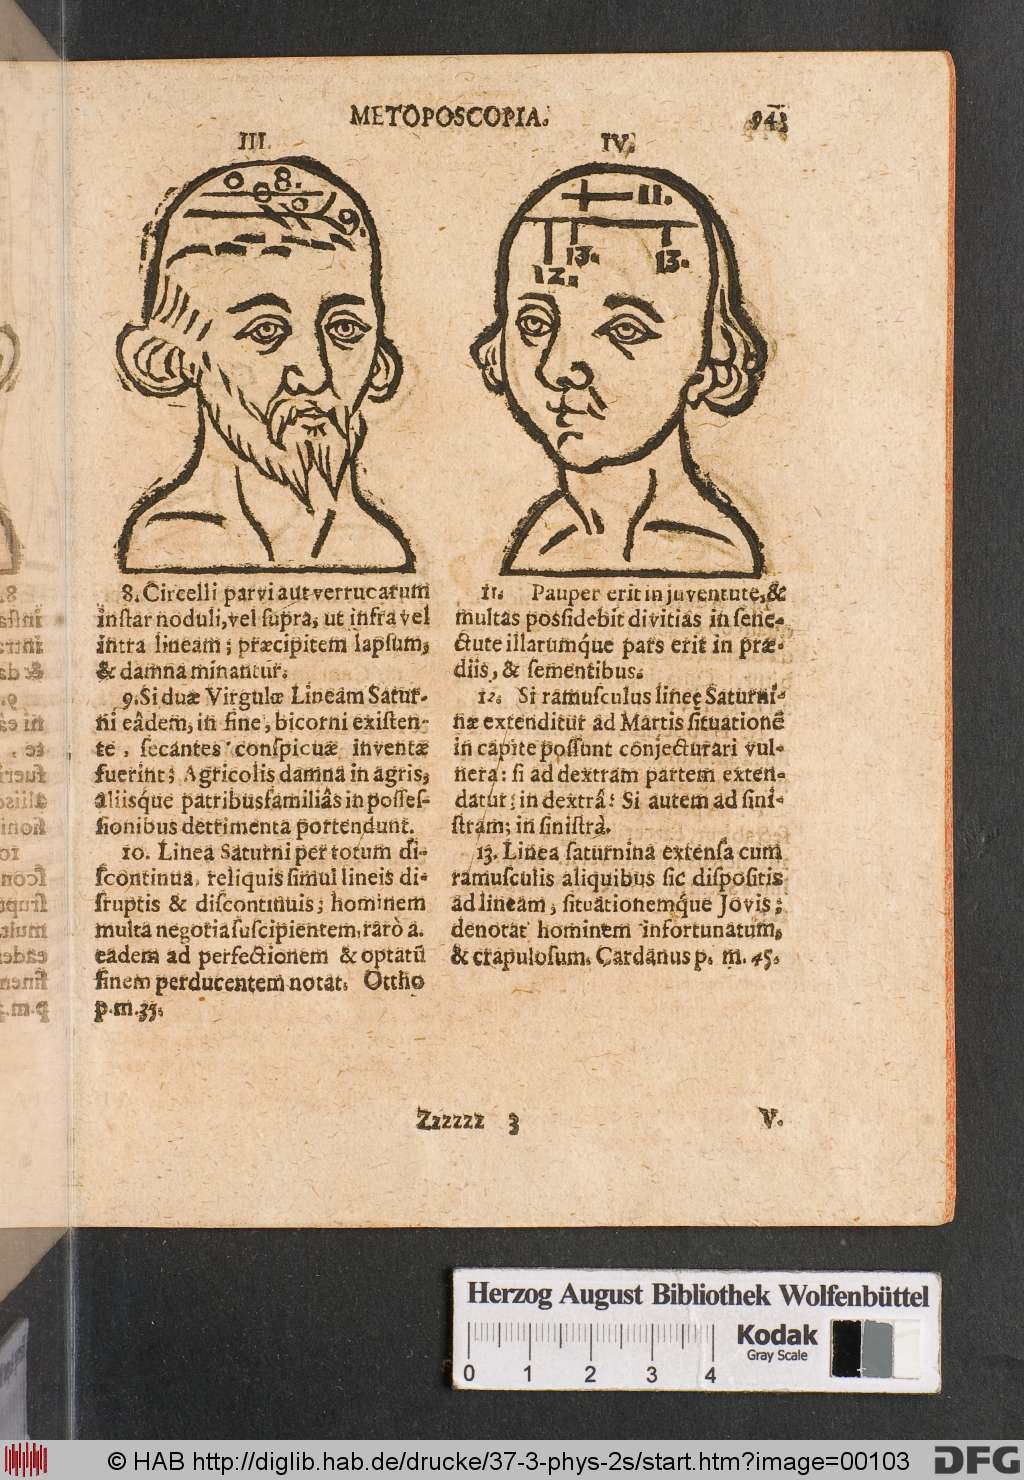 http://diglib.hab.de/drucke/37-3-phys-2s/00103.jpg